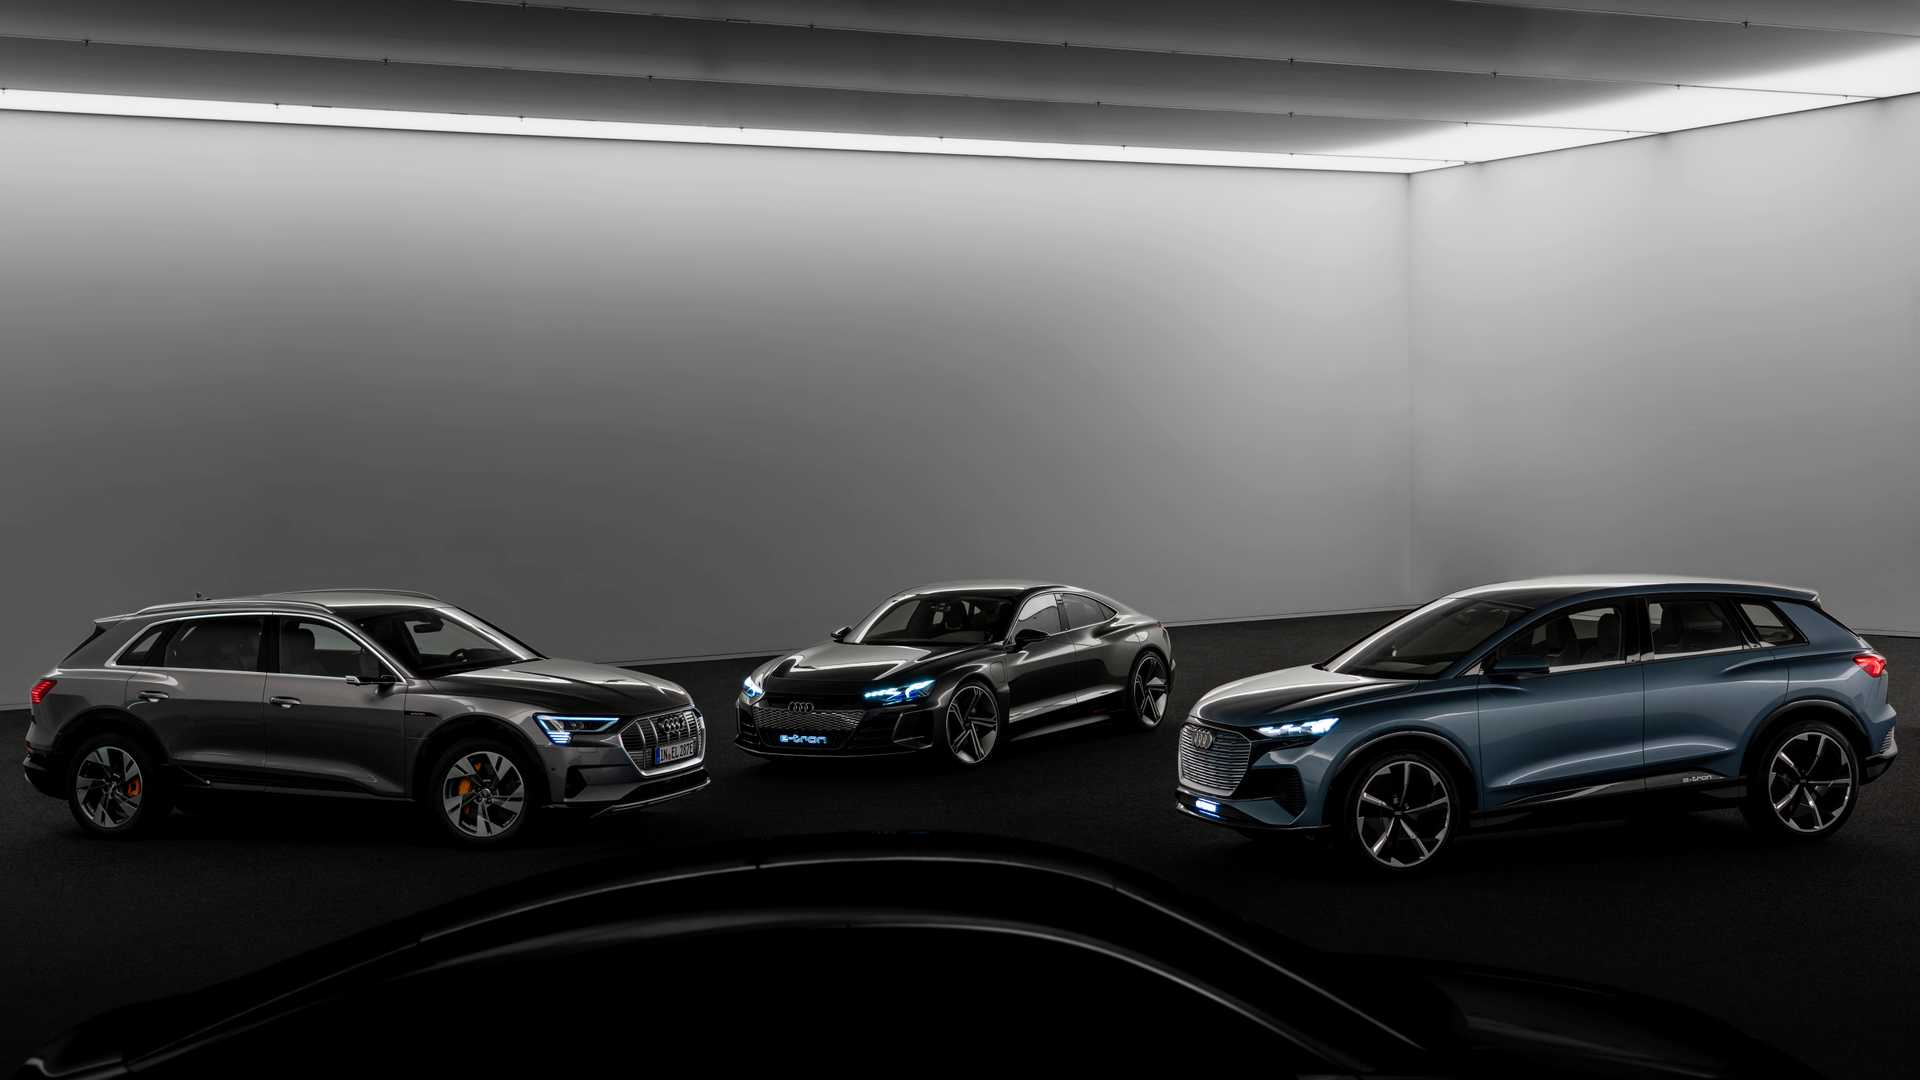 2019 - [Audi] E-Tron Sportback Concept Audi-new-electric-sportback-concept-teaser